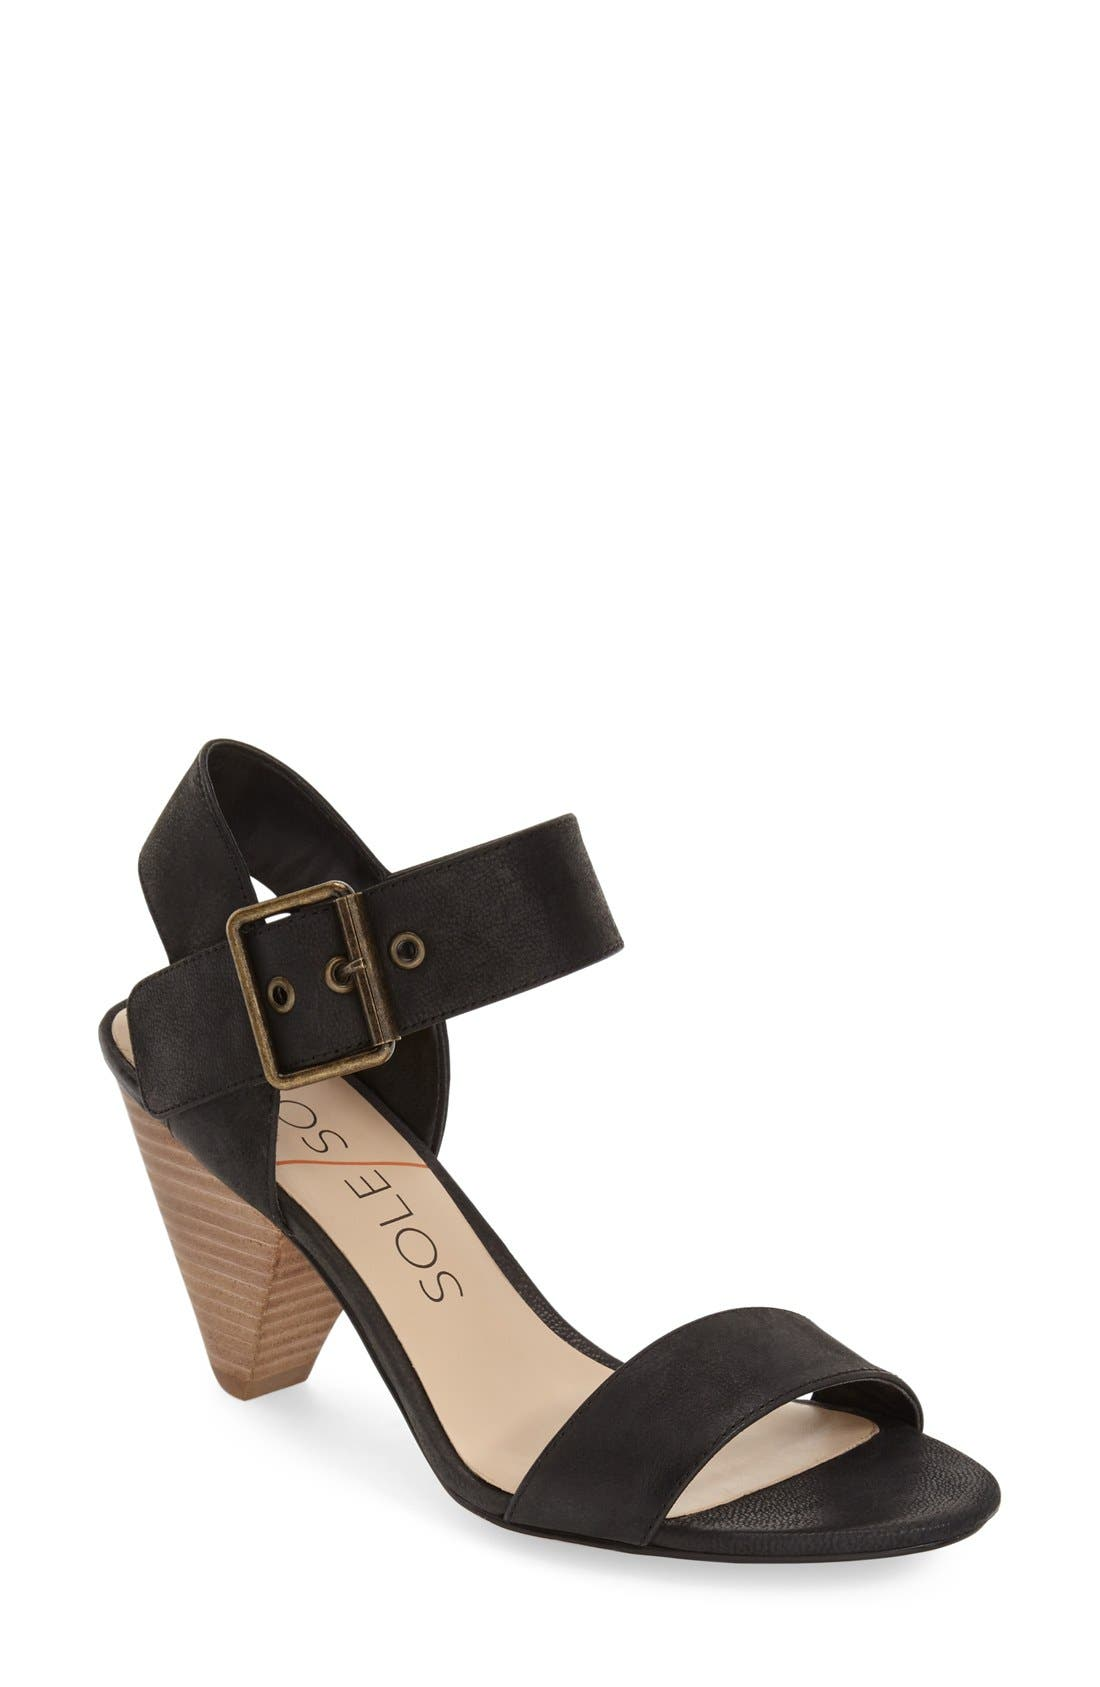 'Missy' Sandal,                         Main,                         color, 001